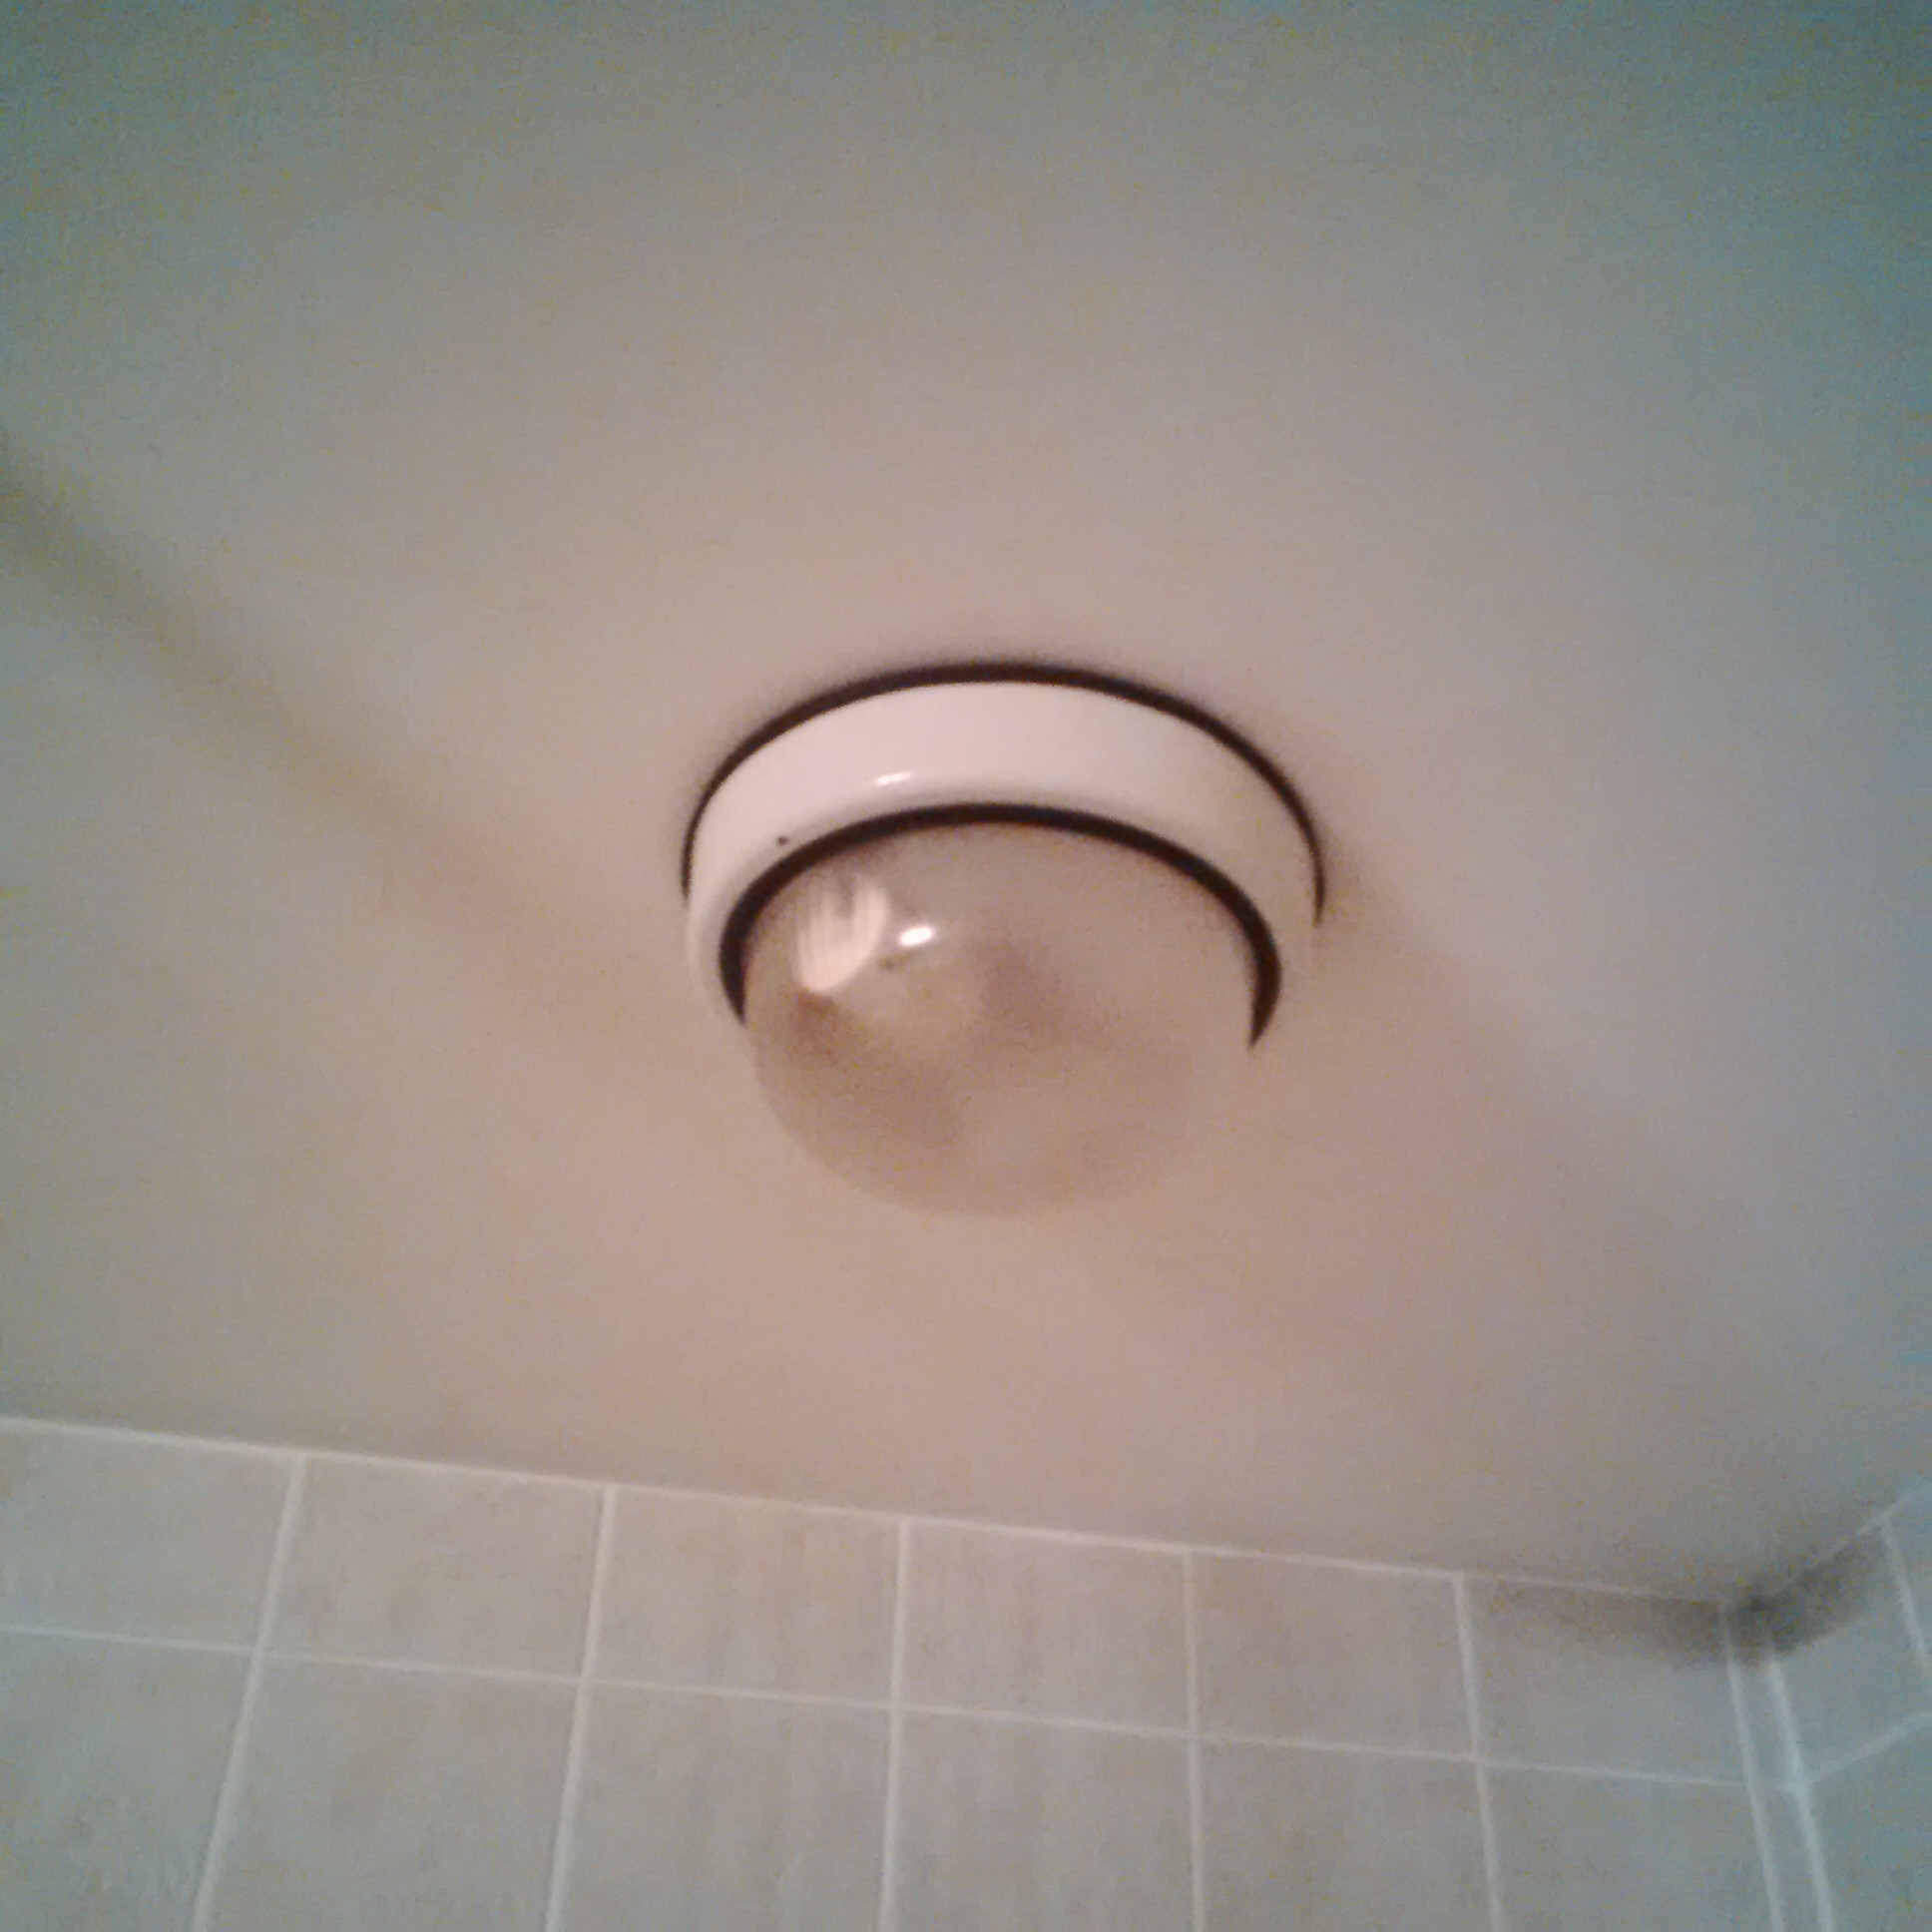 Remove Stuck Light Bulb